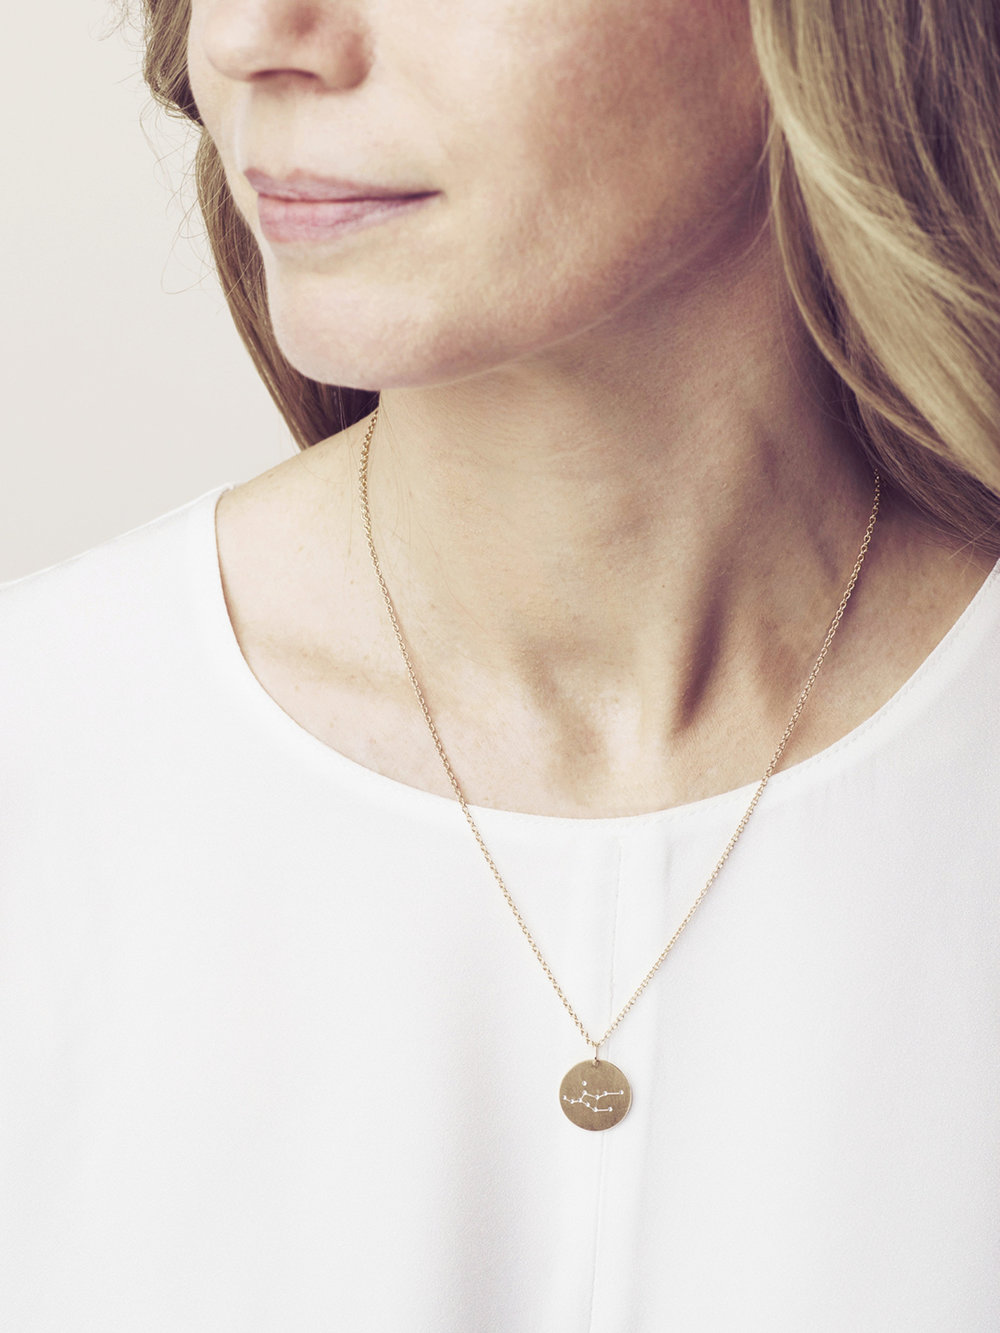 Sternbild Anhänger Jungfrau in goldplatiertem Silber  Zodiac sign pendant Virgo in goldplated silver